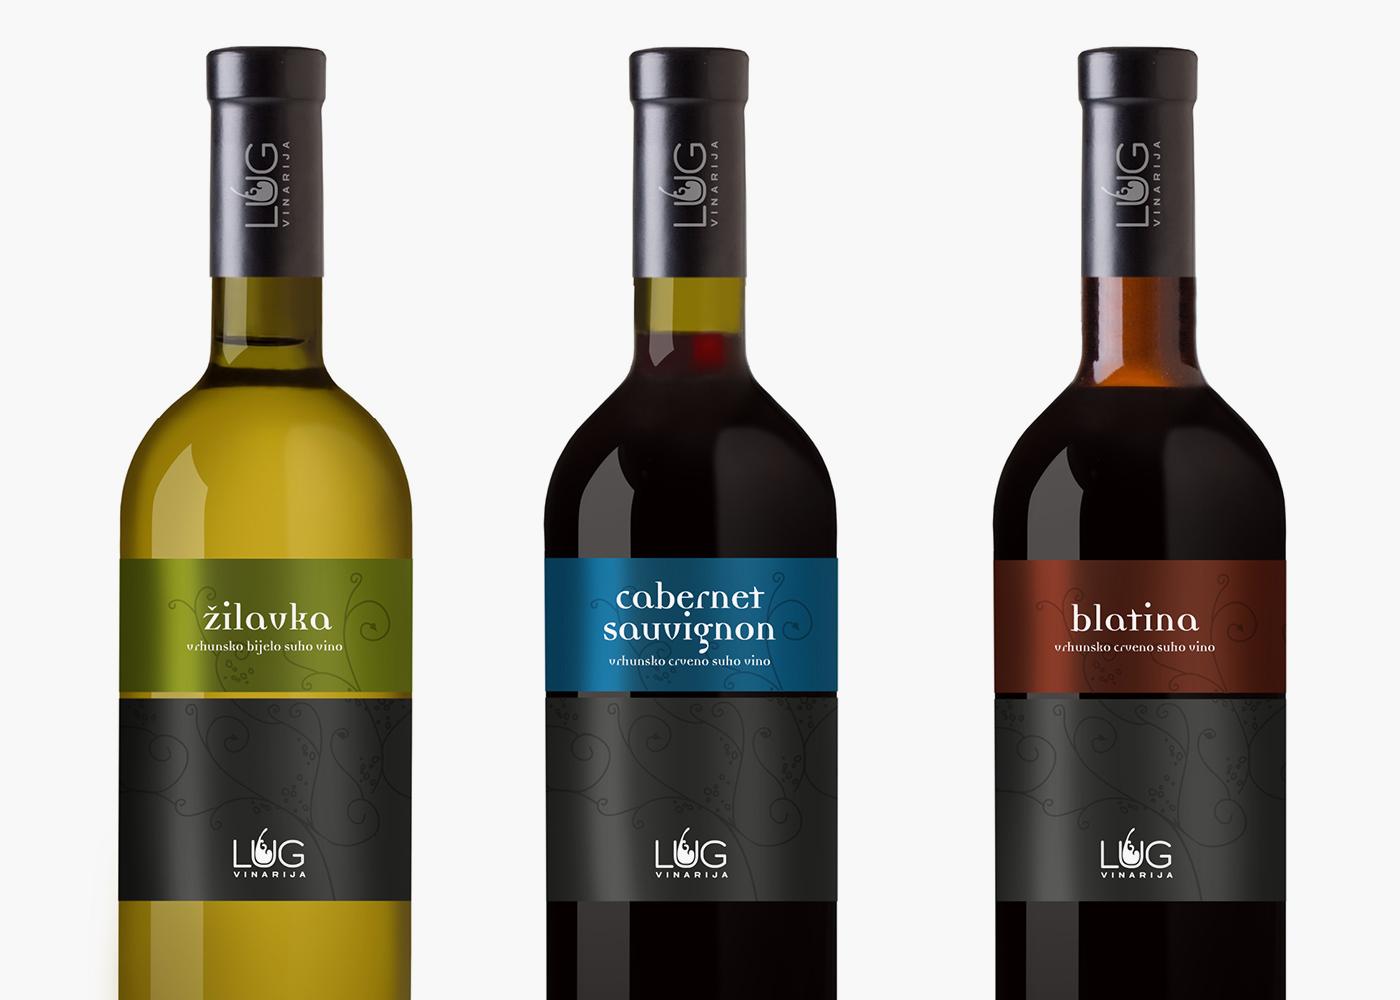 Visual identity of Lug winery